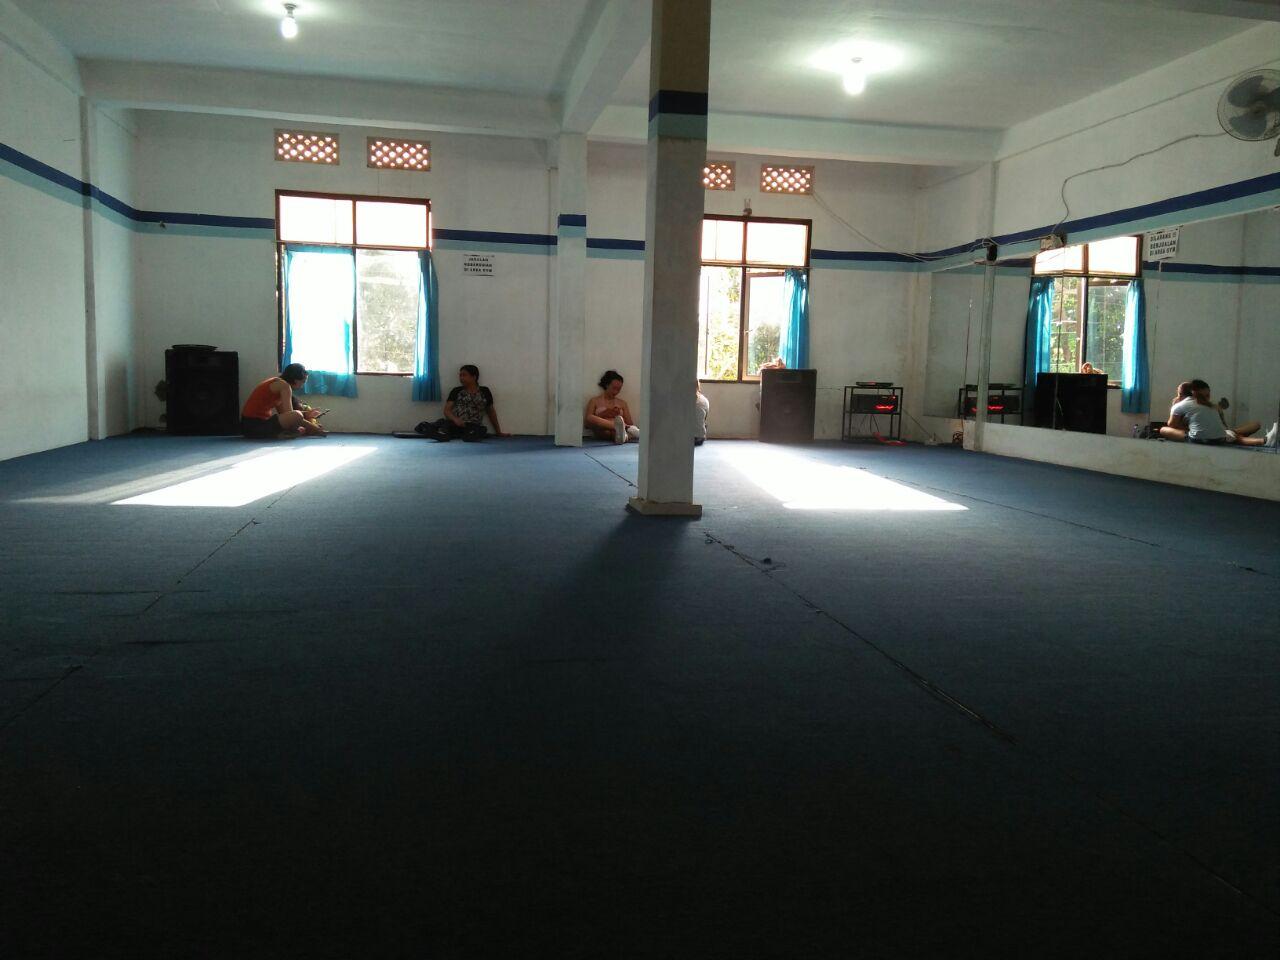 hawa-gym-cabang-rembige-mataram-3